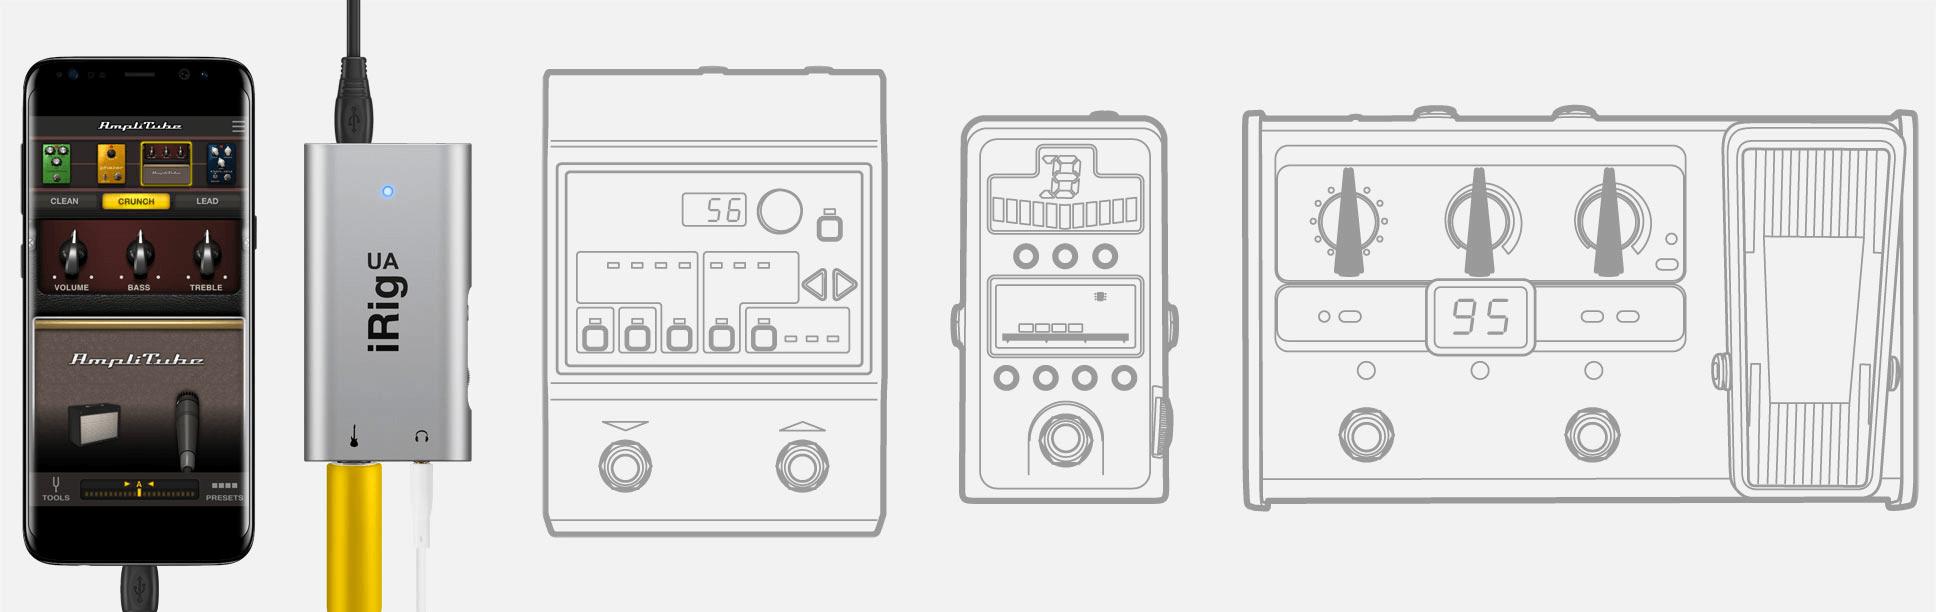 AmpliTube UA - comparison